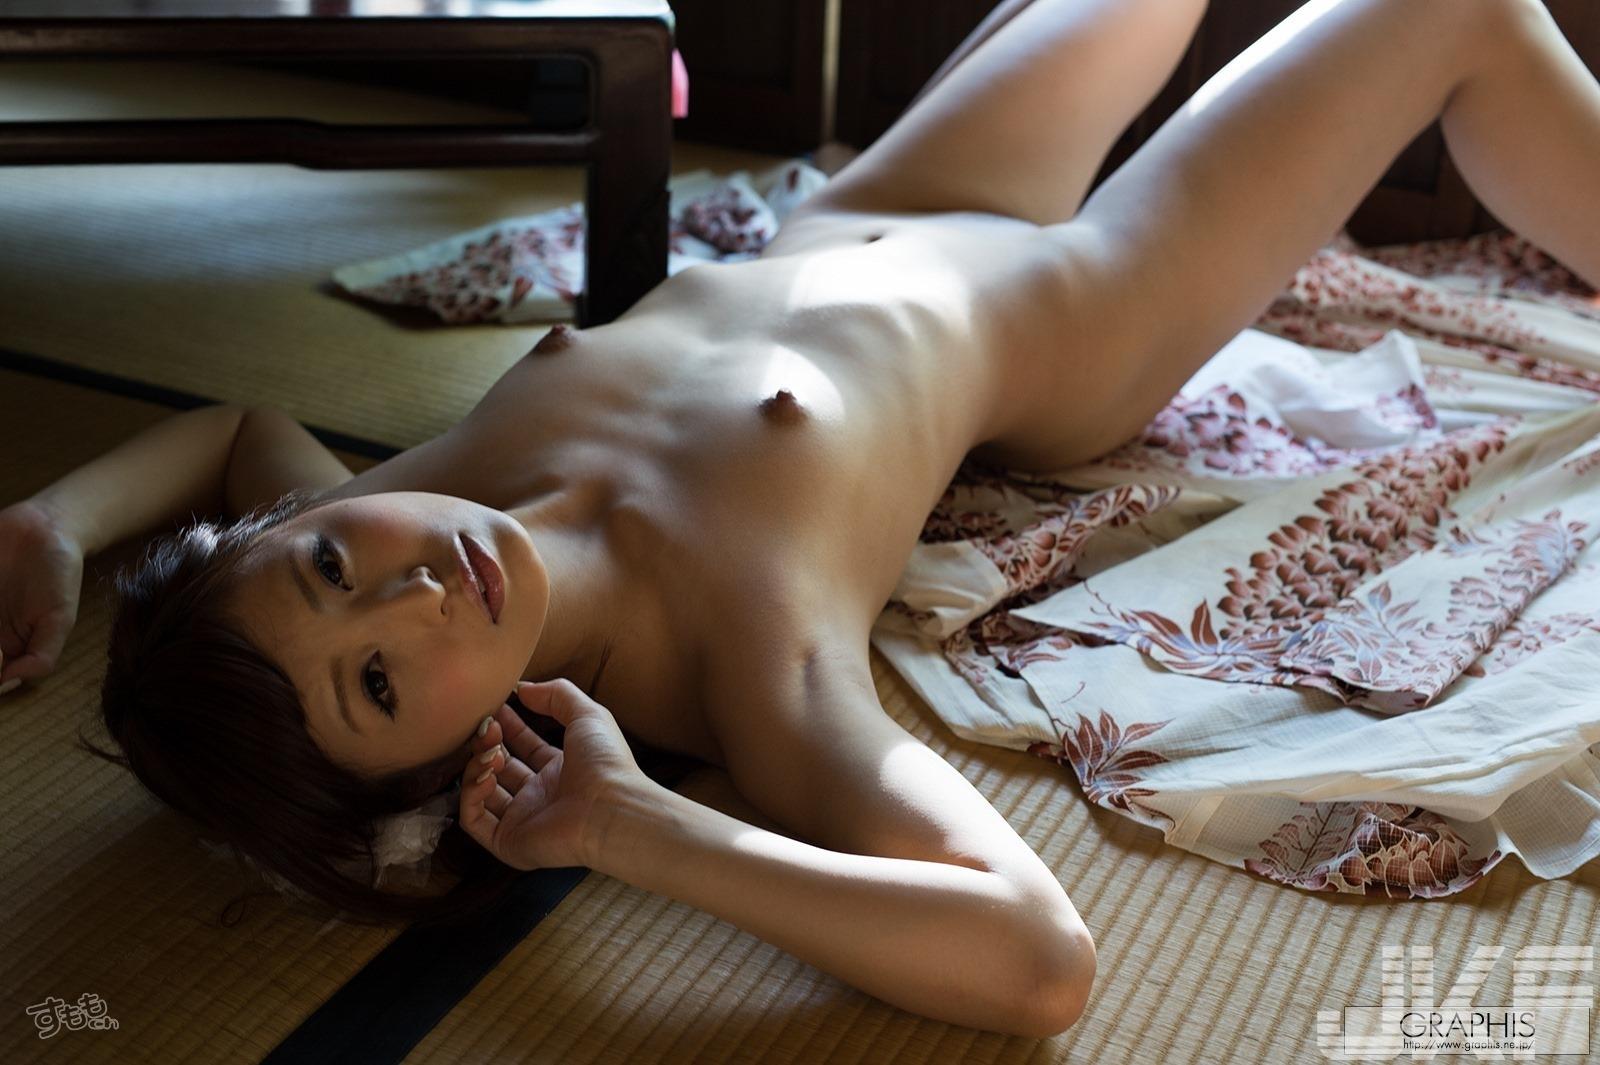 tachibana_harumi_5040-025.jpg